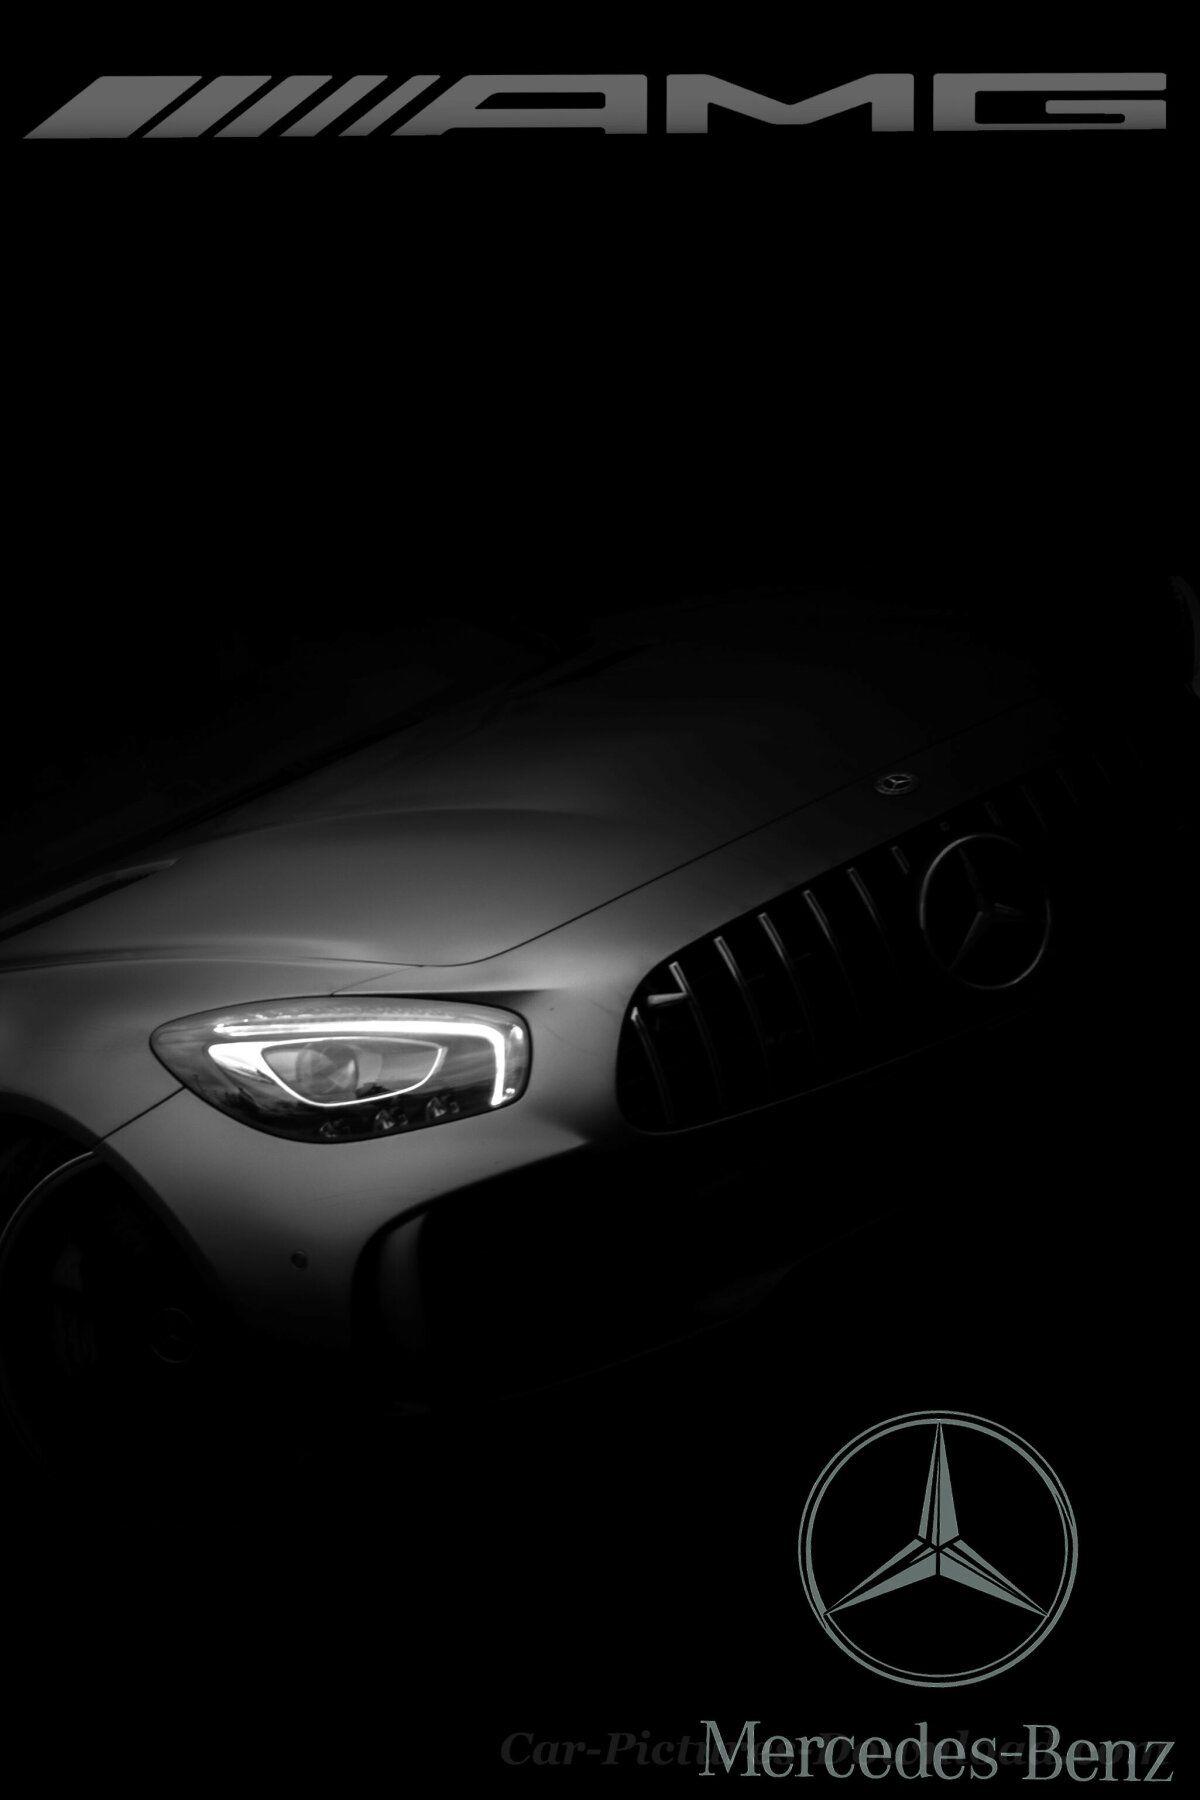 صور سيارة مرسيدس Mercedes سيارات 110 Hd Wallpapers For Mobile High Quality Wallpapers Iphone Wallpaper